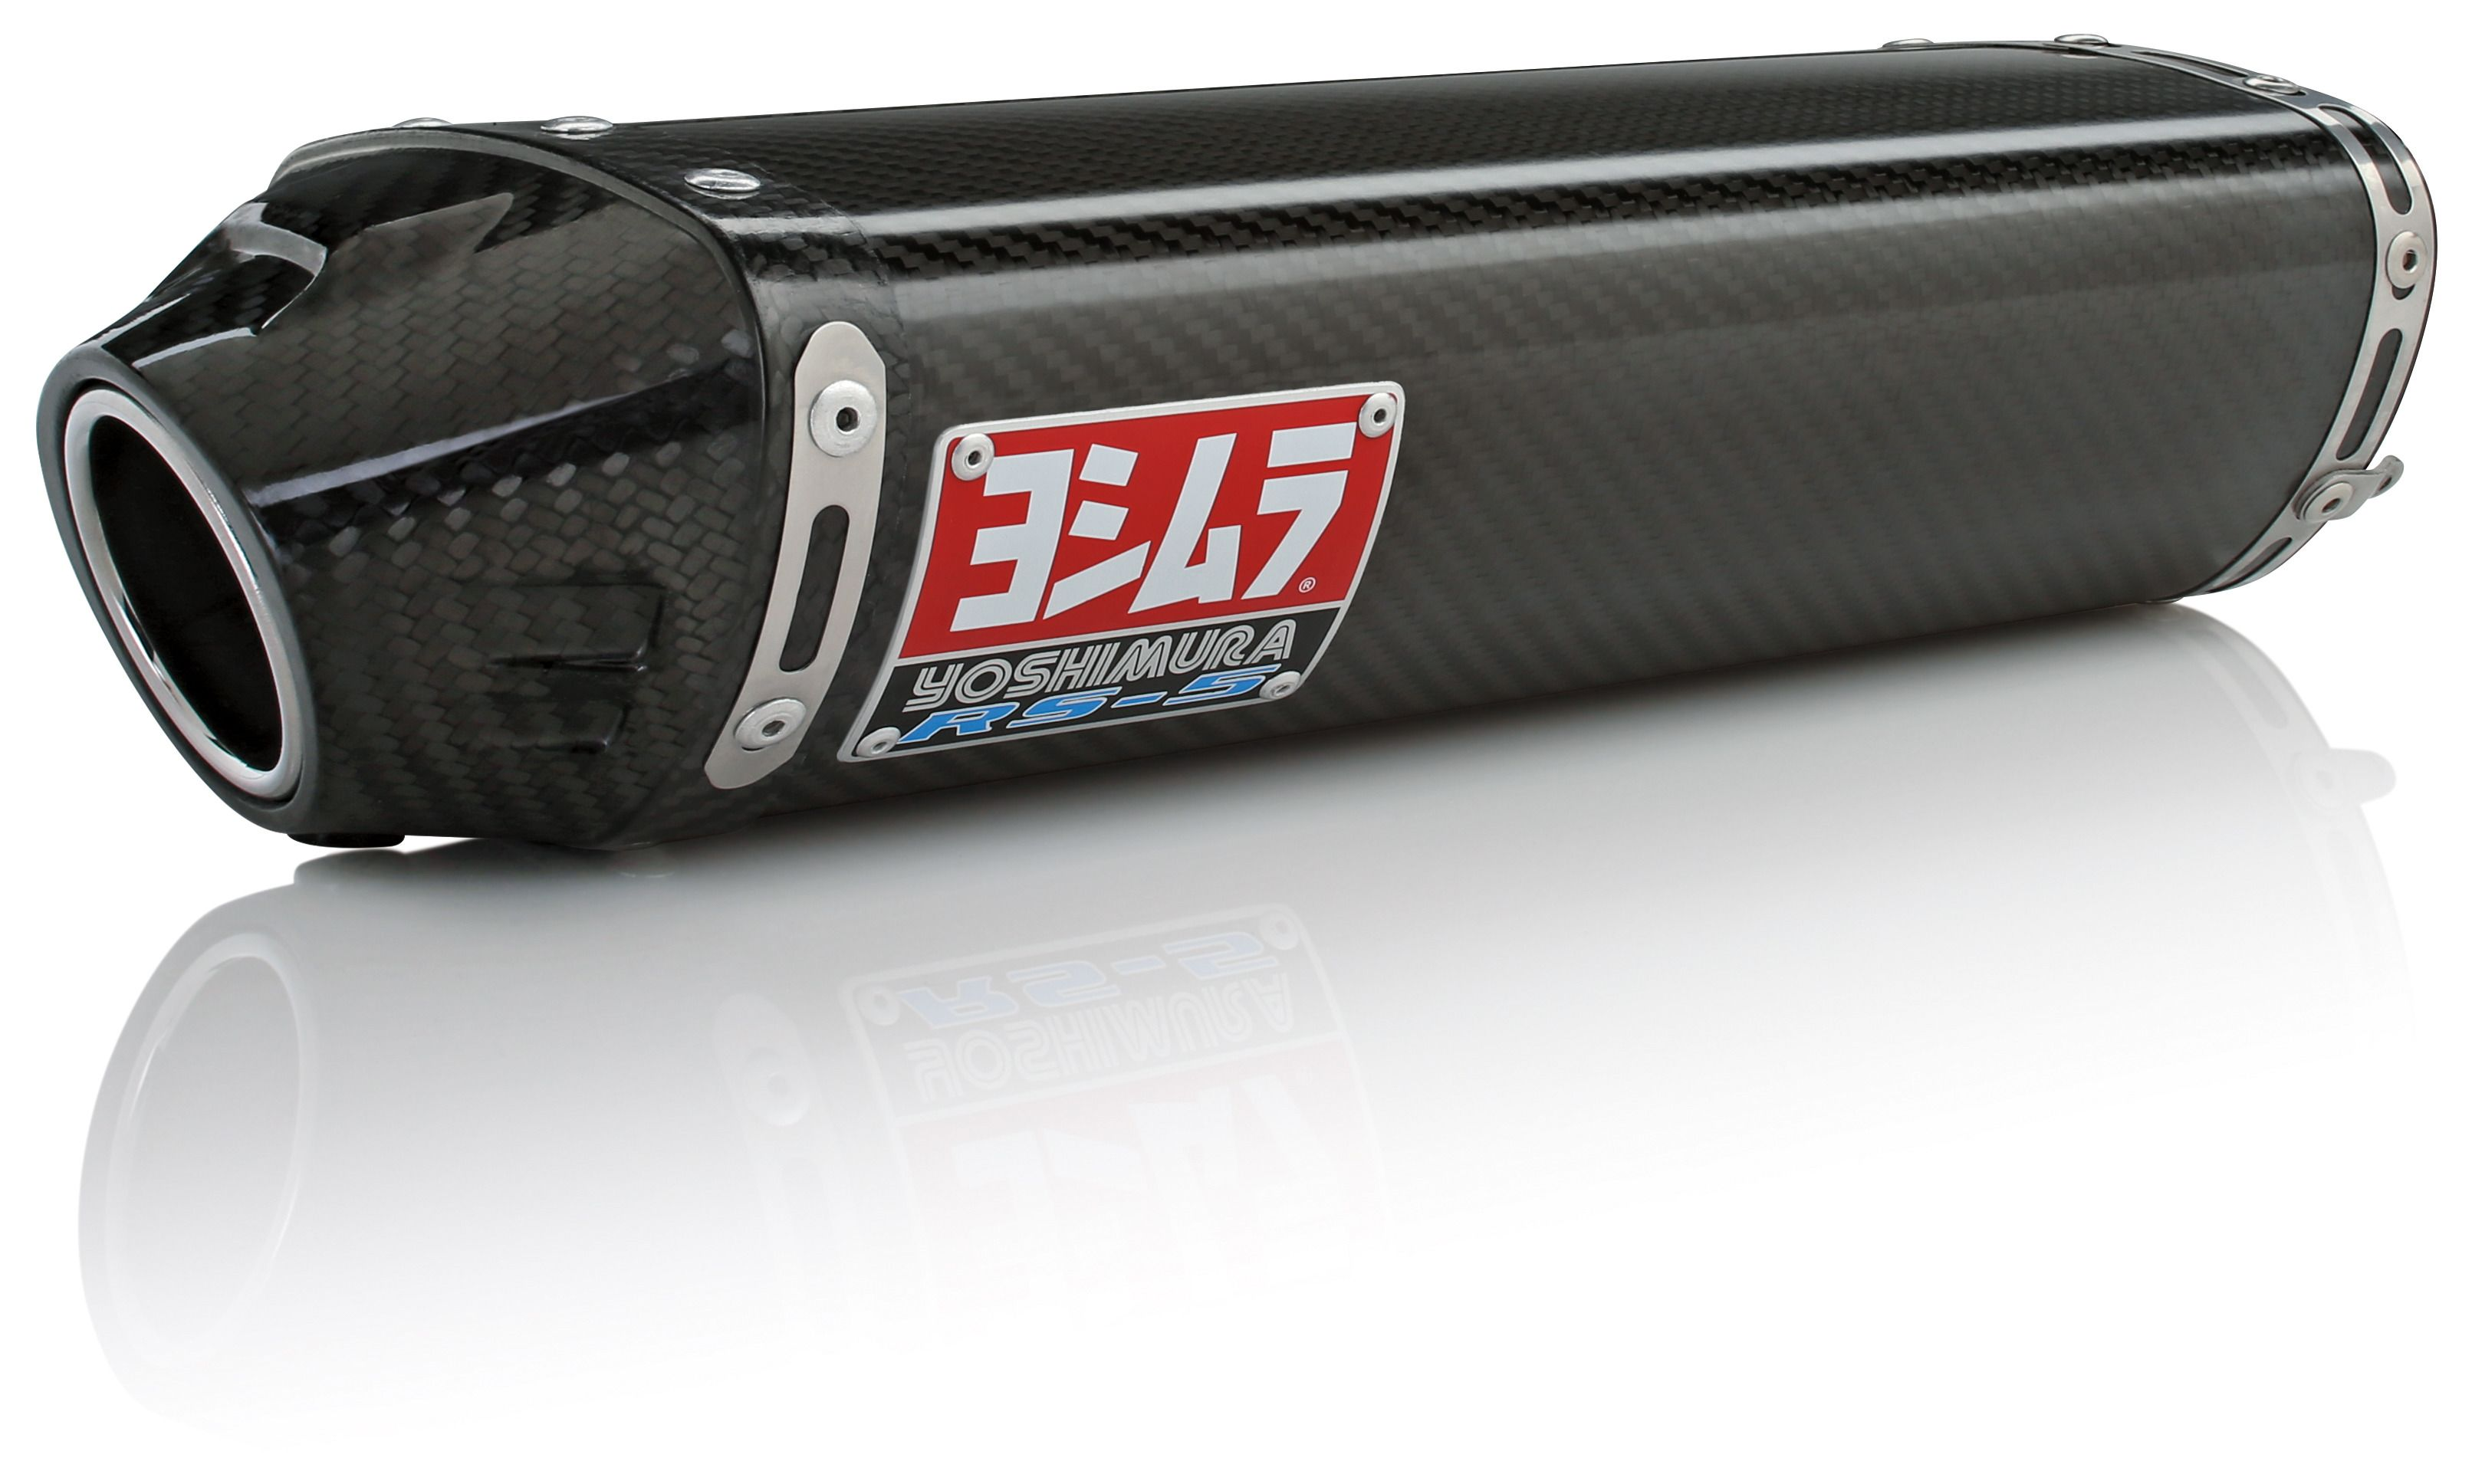 Yoshimura Rs5 Race Slip On Exhaust Honda Cbr1000rr 2004 2007 10 Wiring Diagram 4290 Off Revzilla